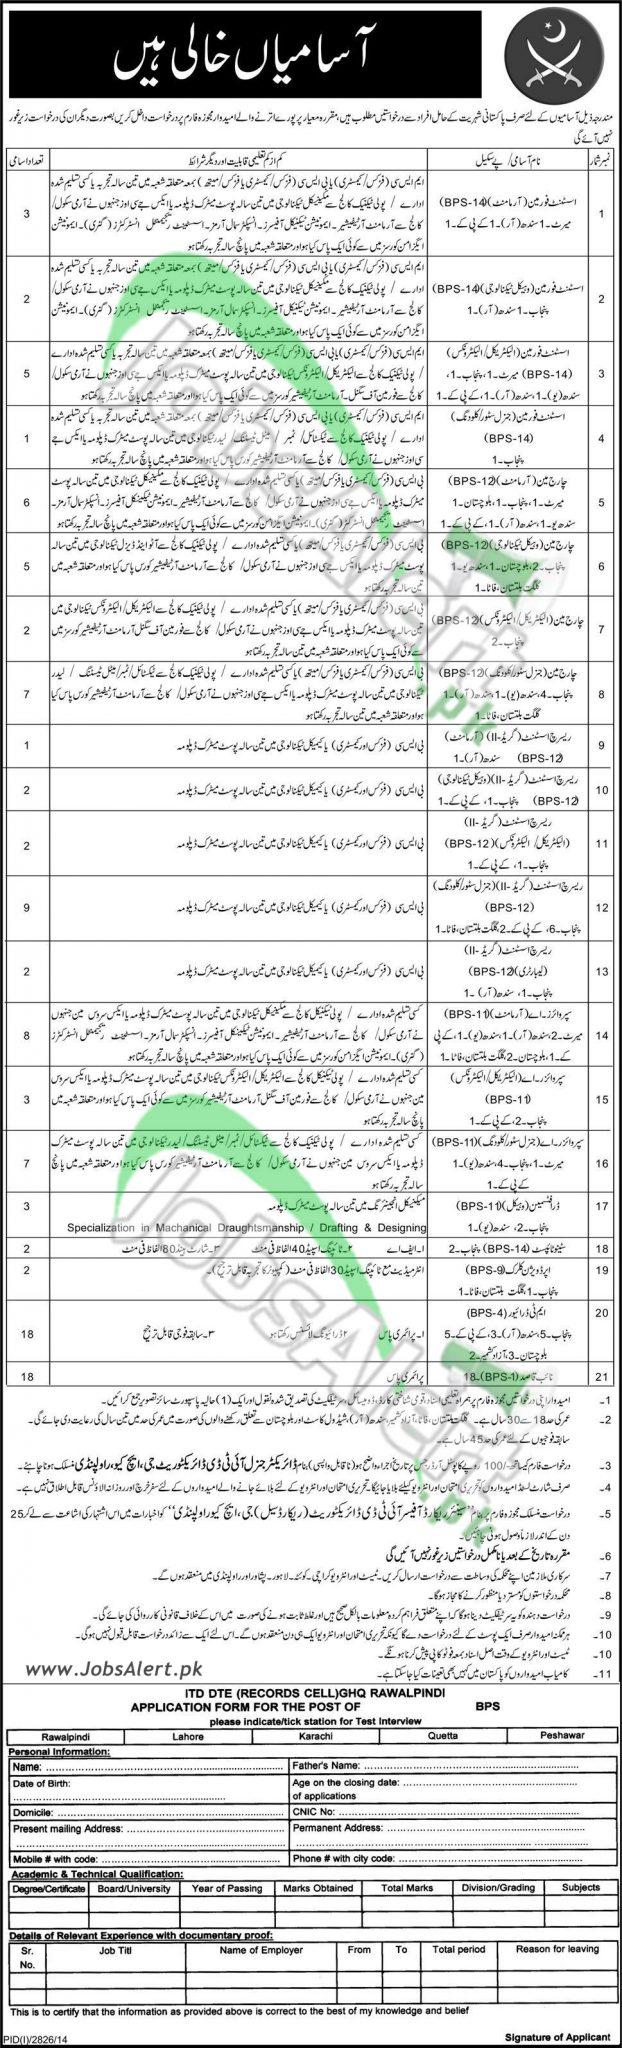 ITD Directorate GHQ Rawalpindi